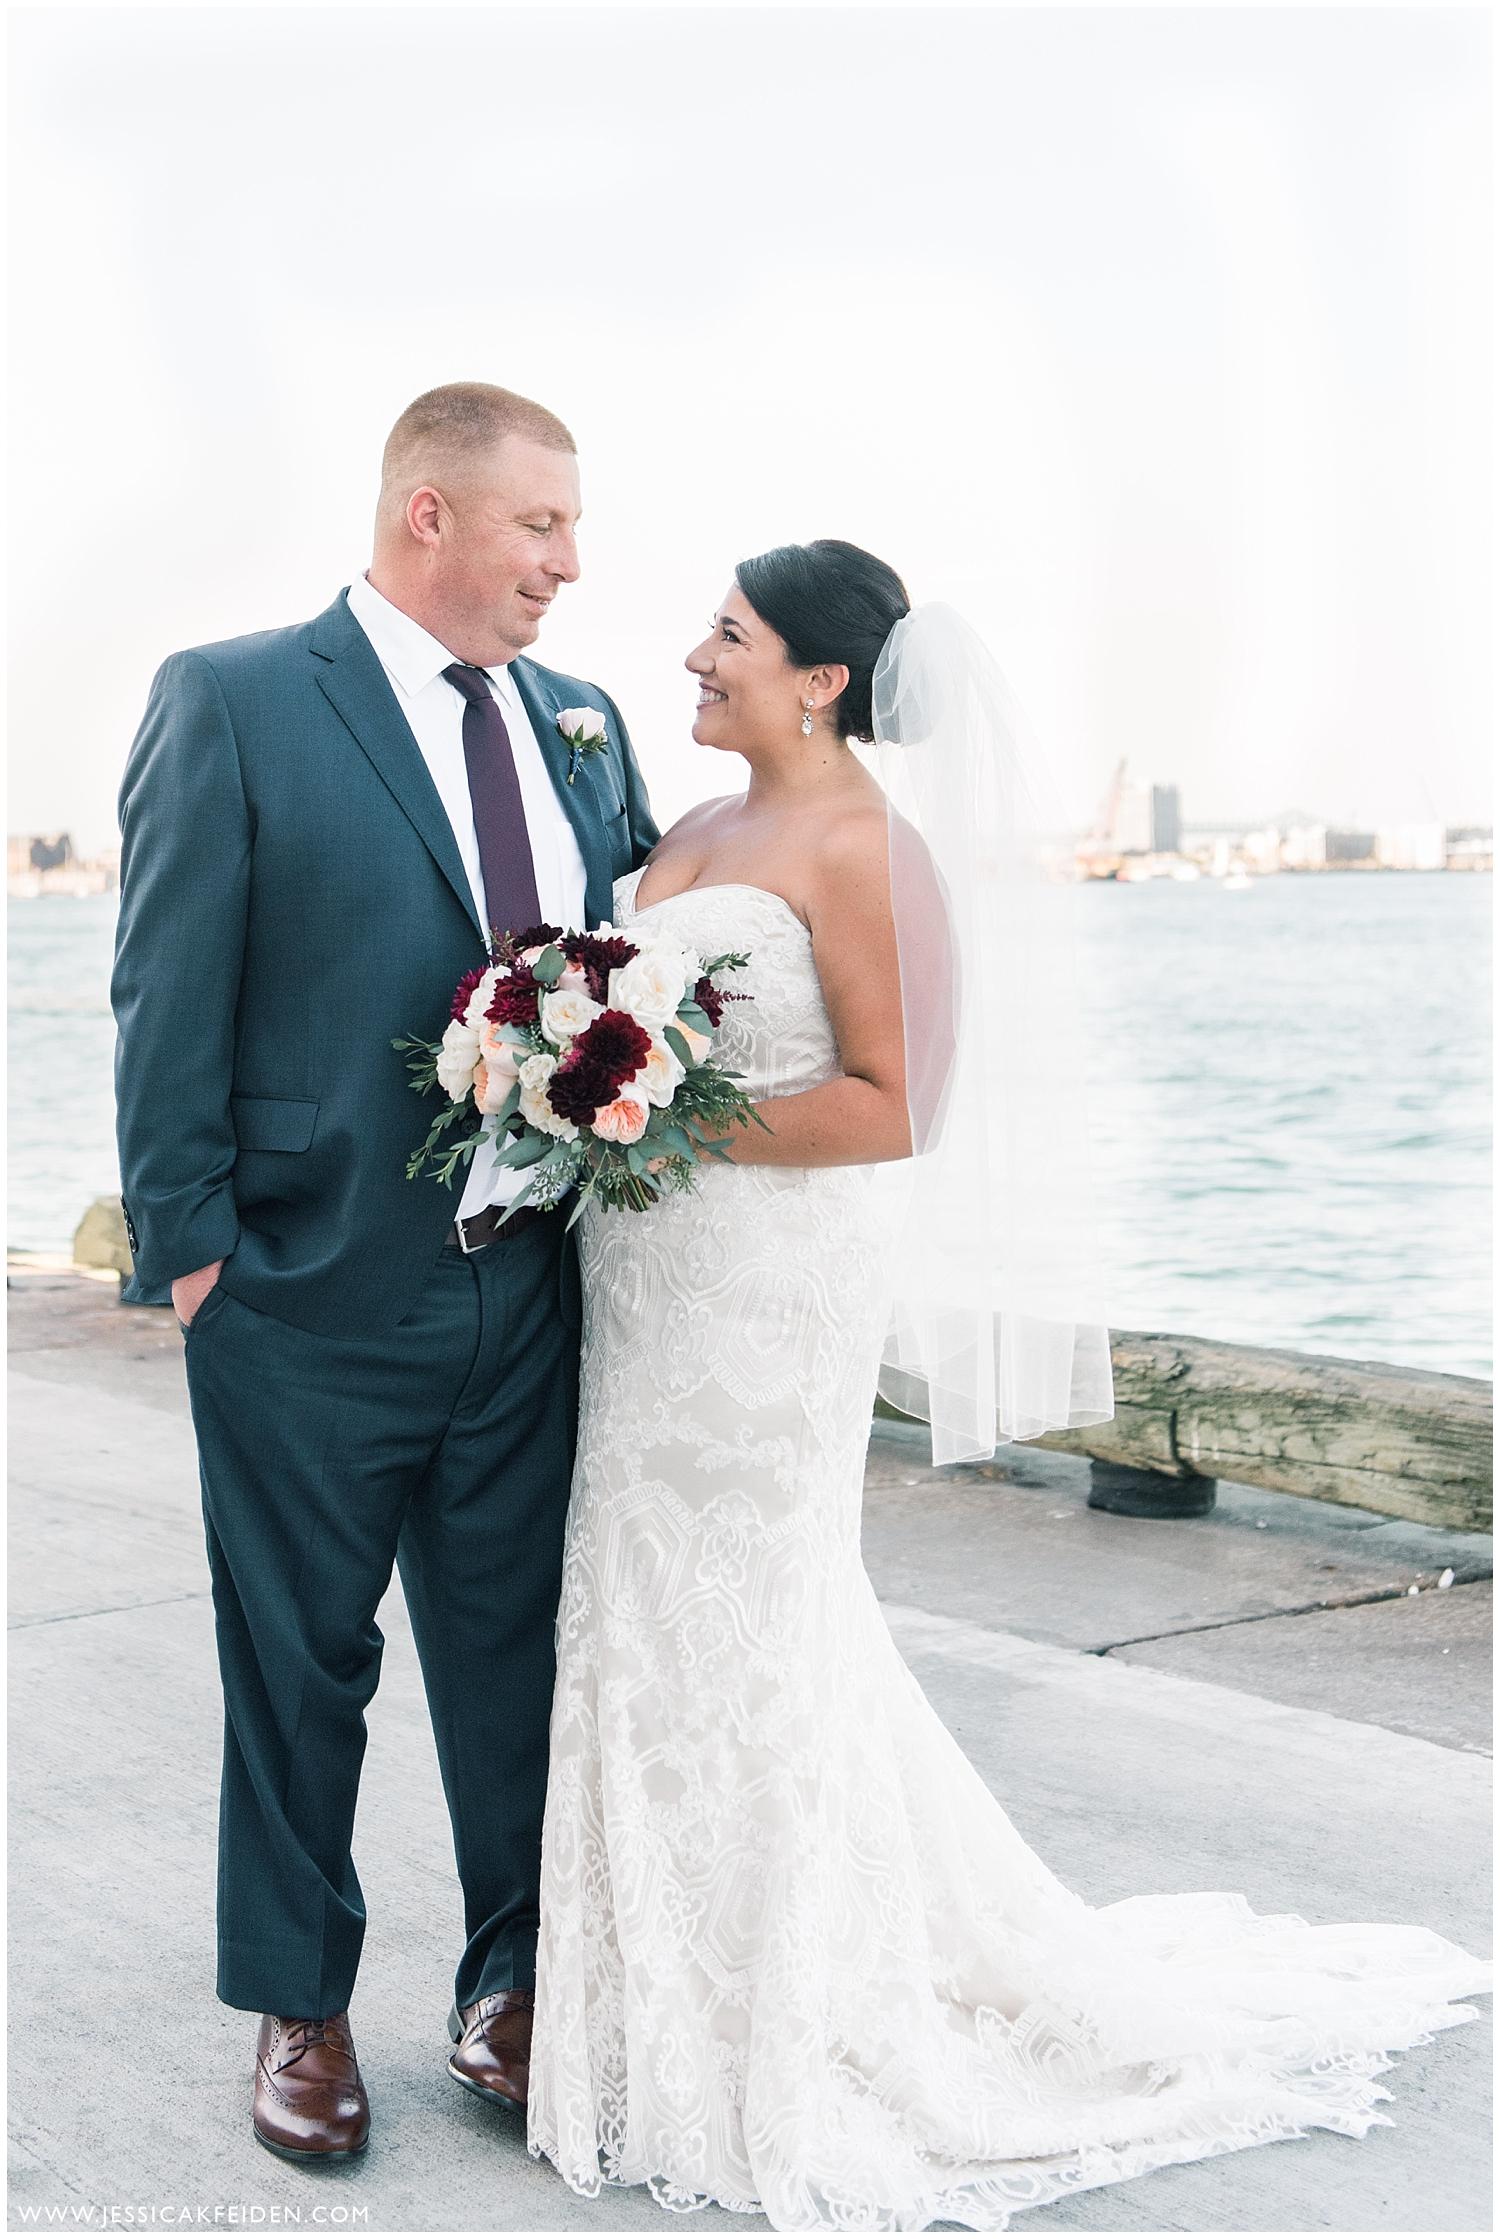 Jessica K Feiden Photography - Boston Exchange Center Wedding_0038.jpg